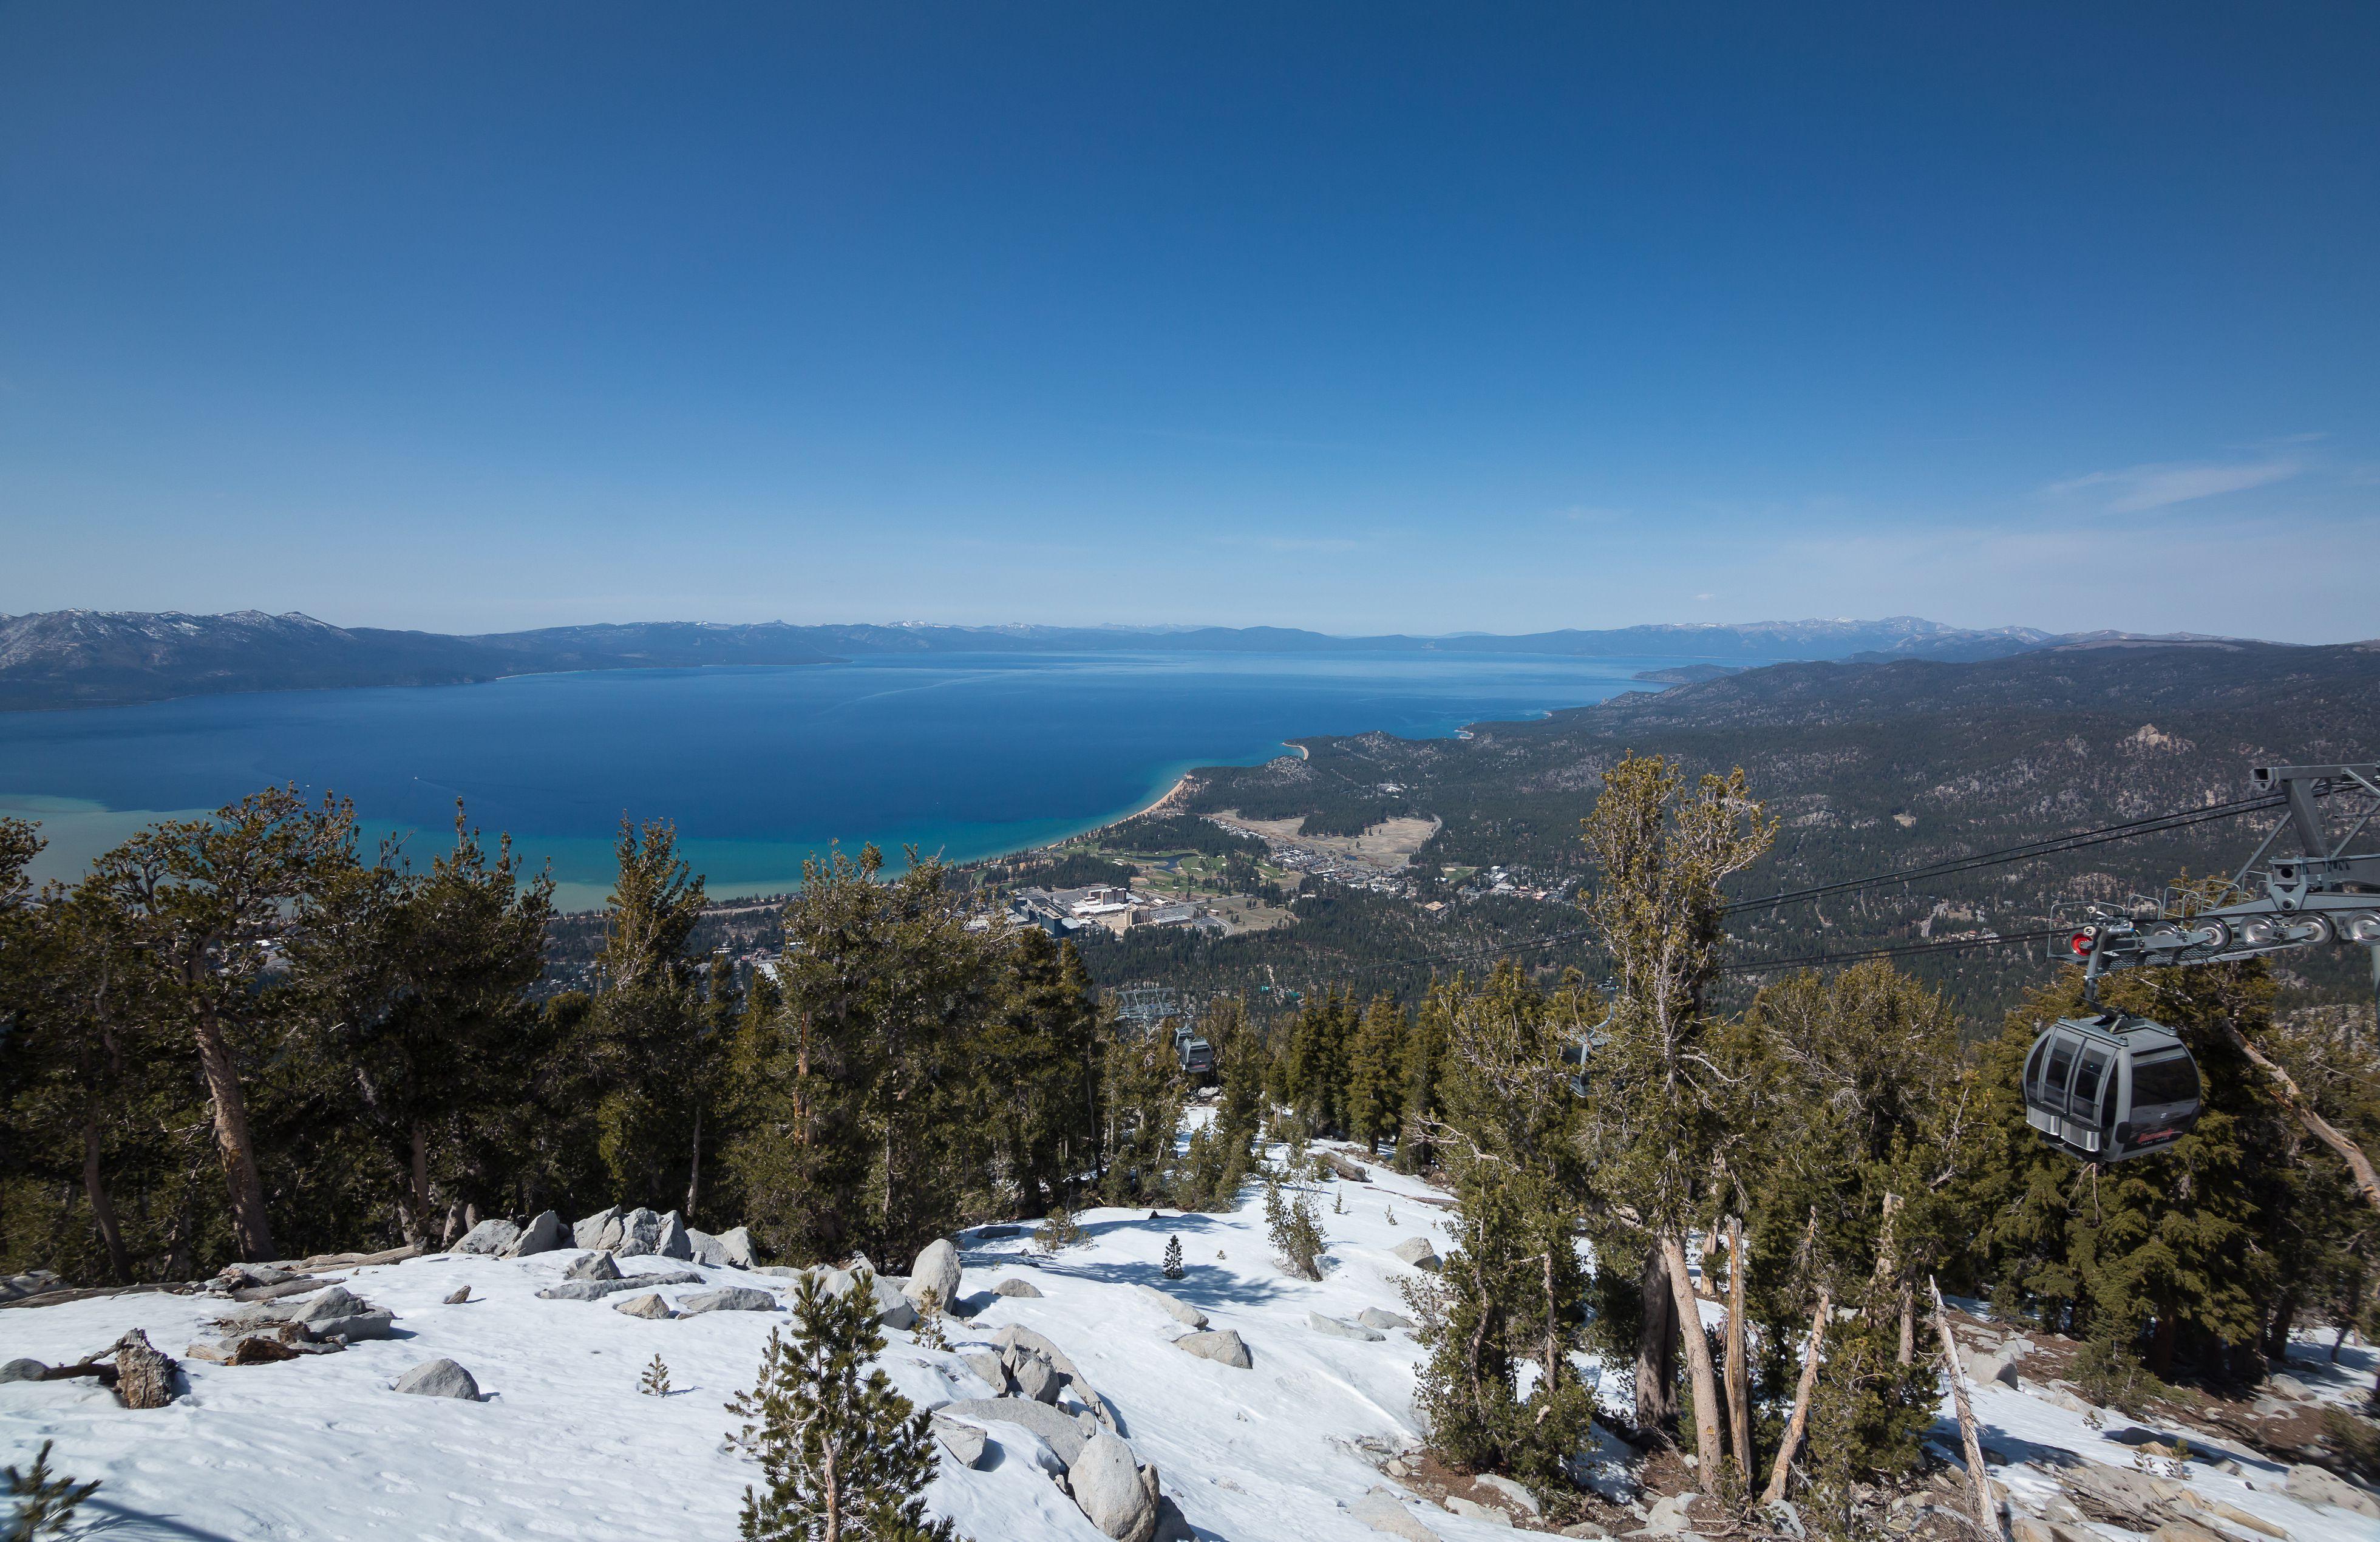 Gondola and view of Lake Tahoe at Heavenly Resort